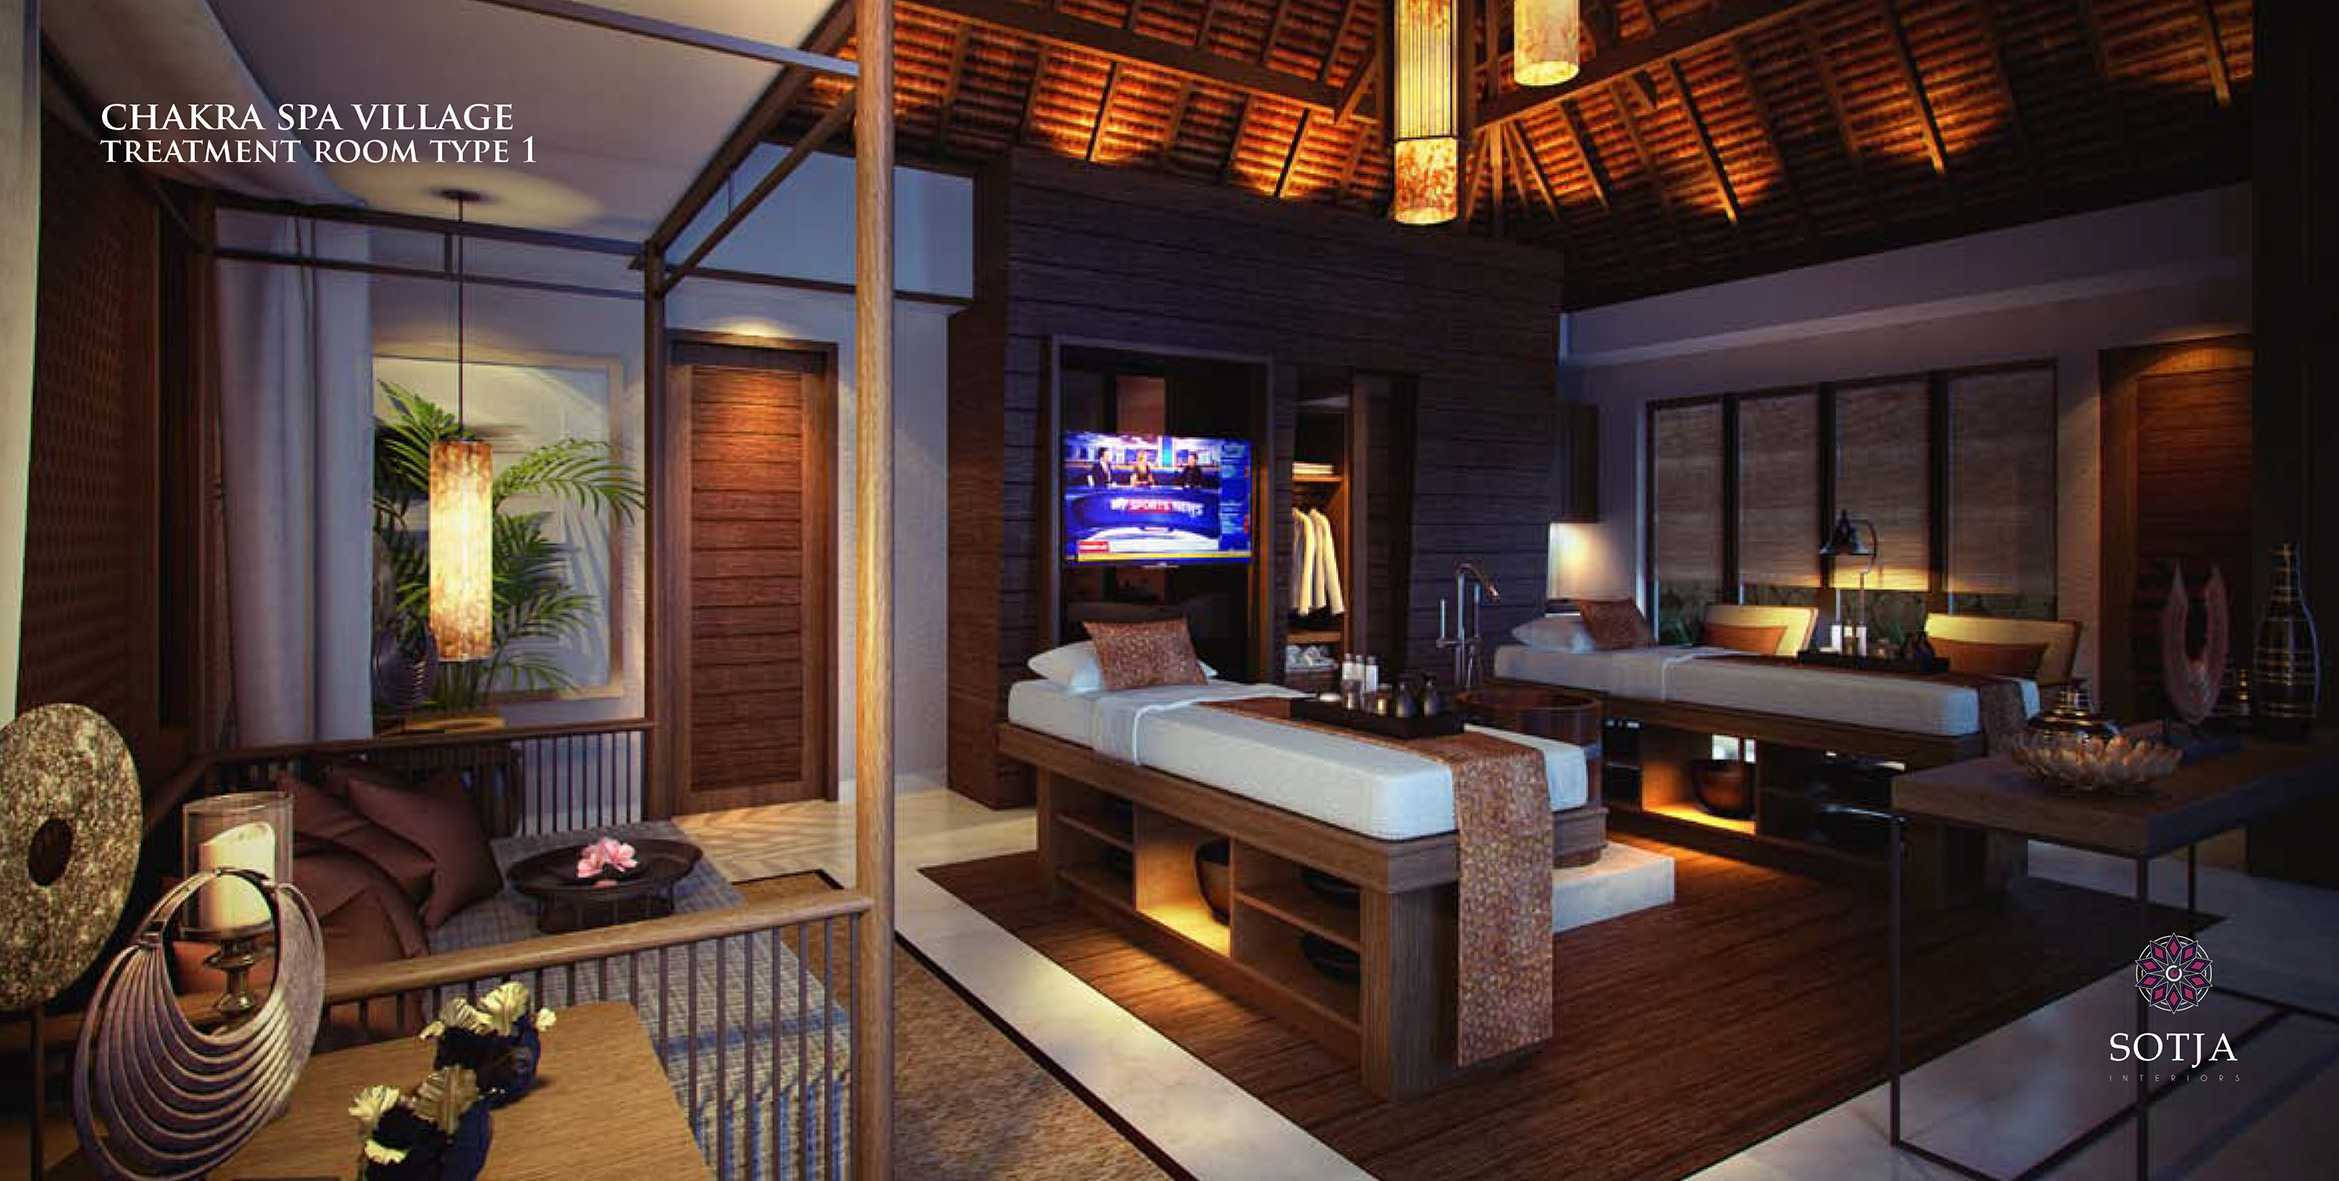 Sotja Interiors Chakra Spa Village At Batam Riau, Indonesia Riau, Indonesia Treatment-Room-Type-1   9919